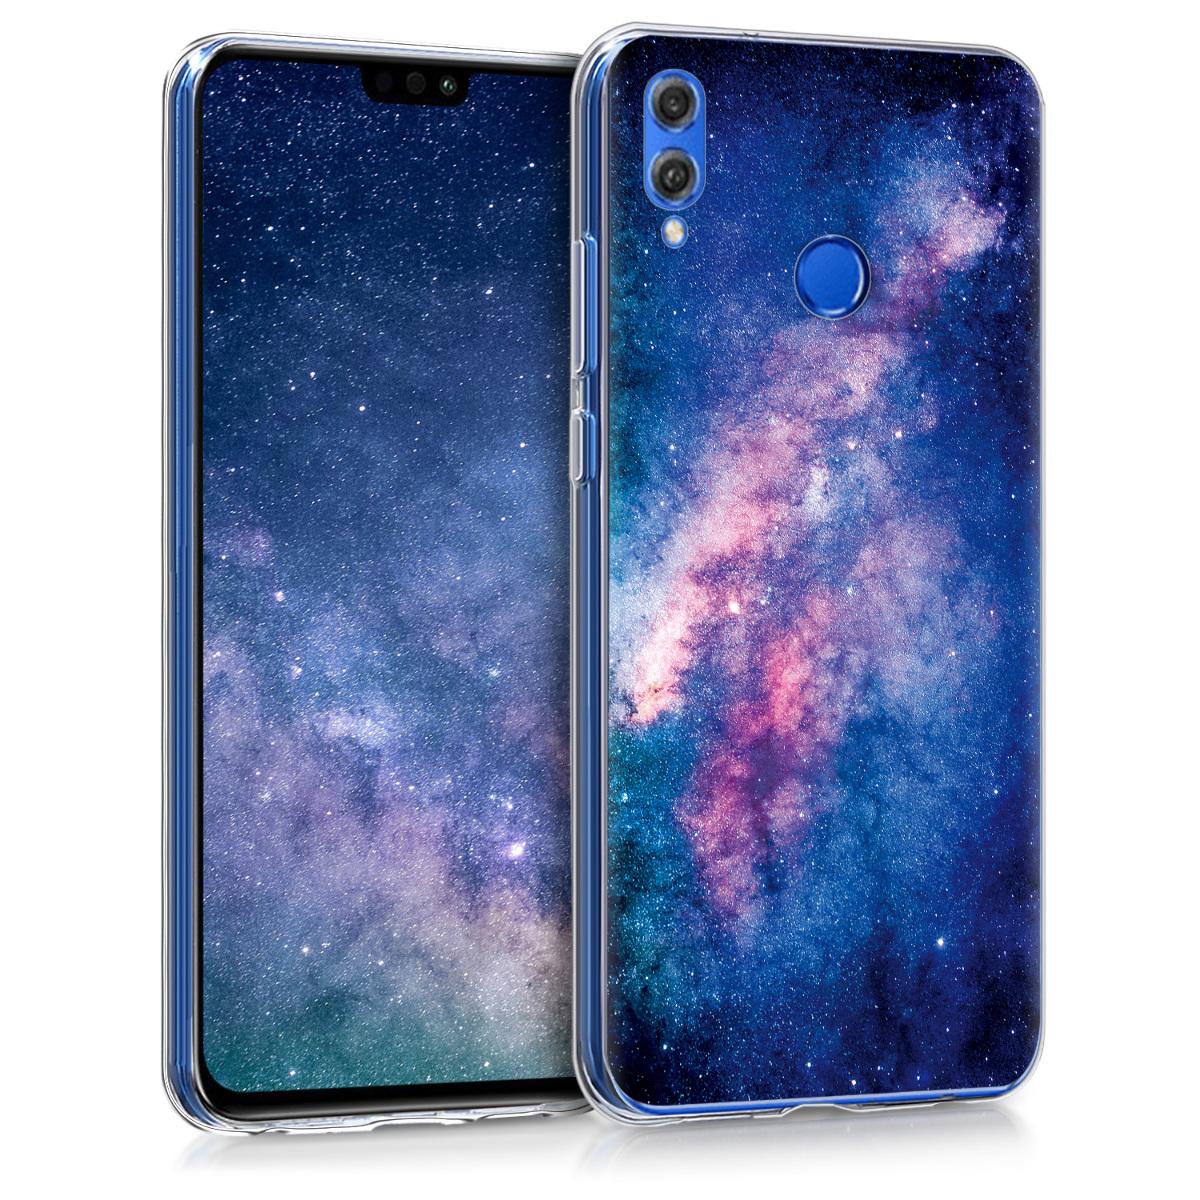 KW Θήκη Σιλικόνης Huawei Honor 8X - Light Pink / Dark Pink / Dark Blue (48927.03)